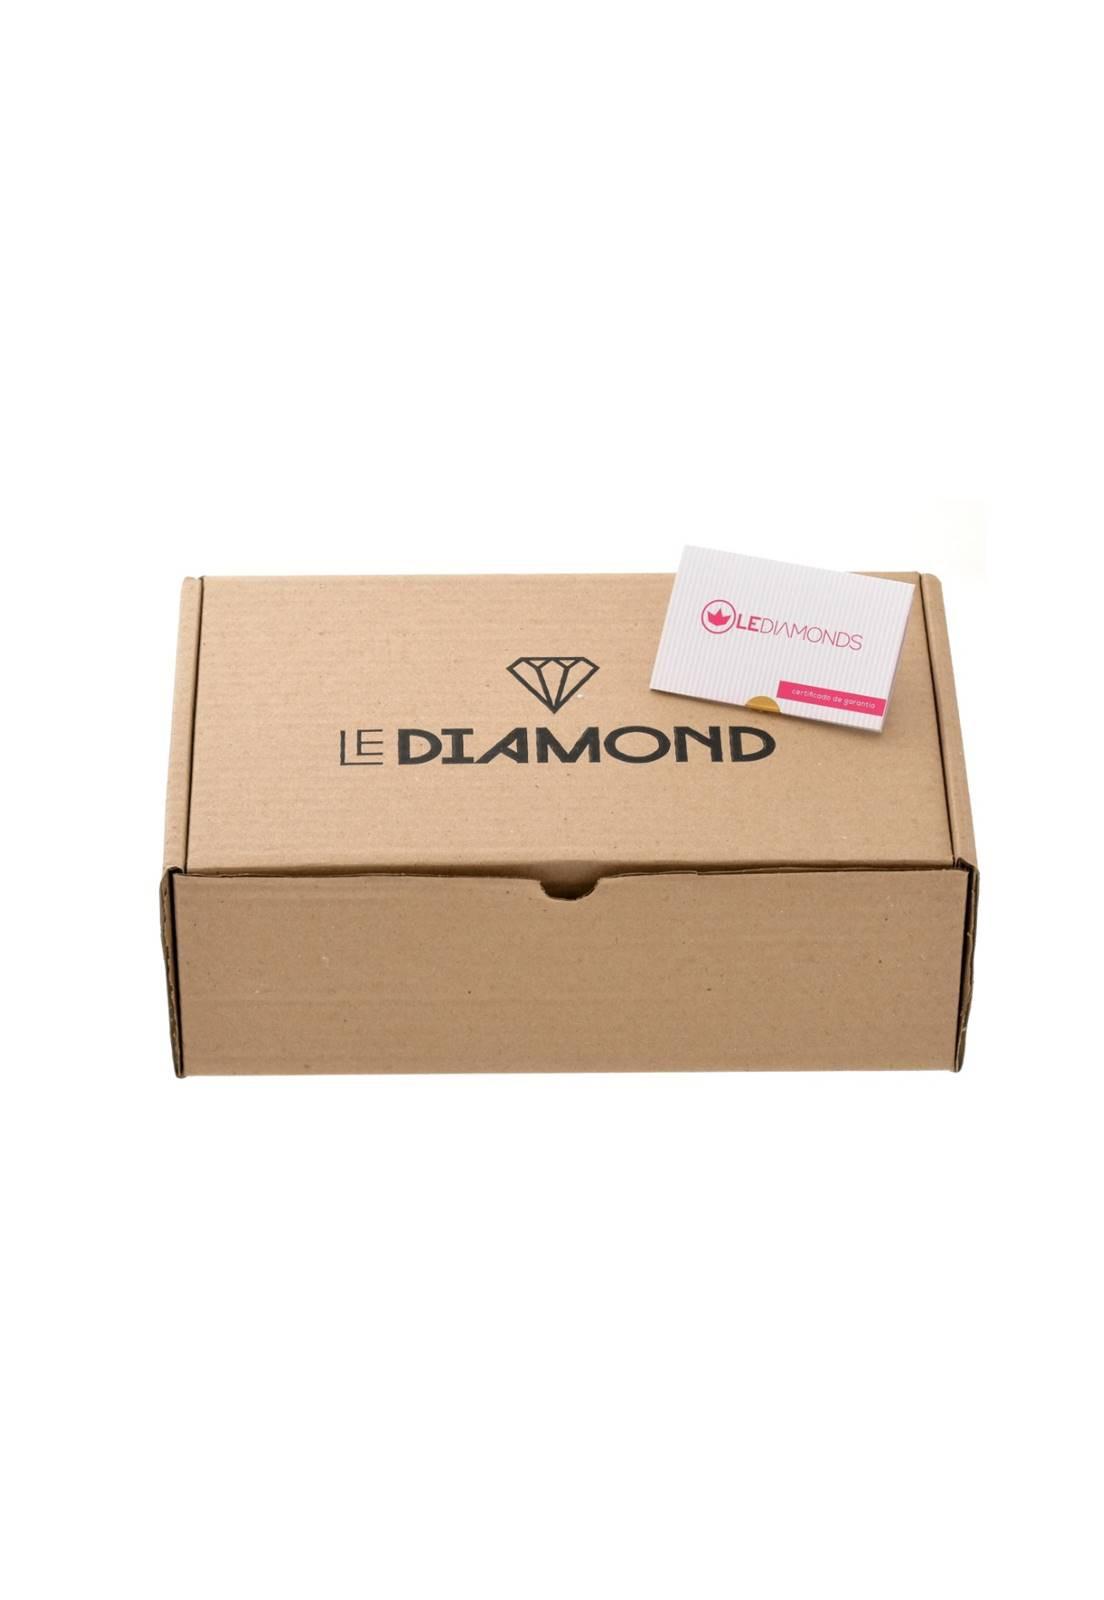 Brinco Le Diamond Argolinha c/ Pingente c/ 4 Perolas Colorida Rosa